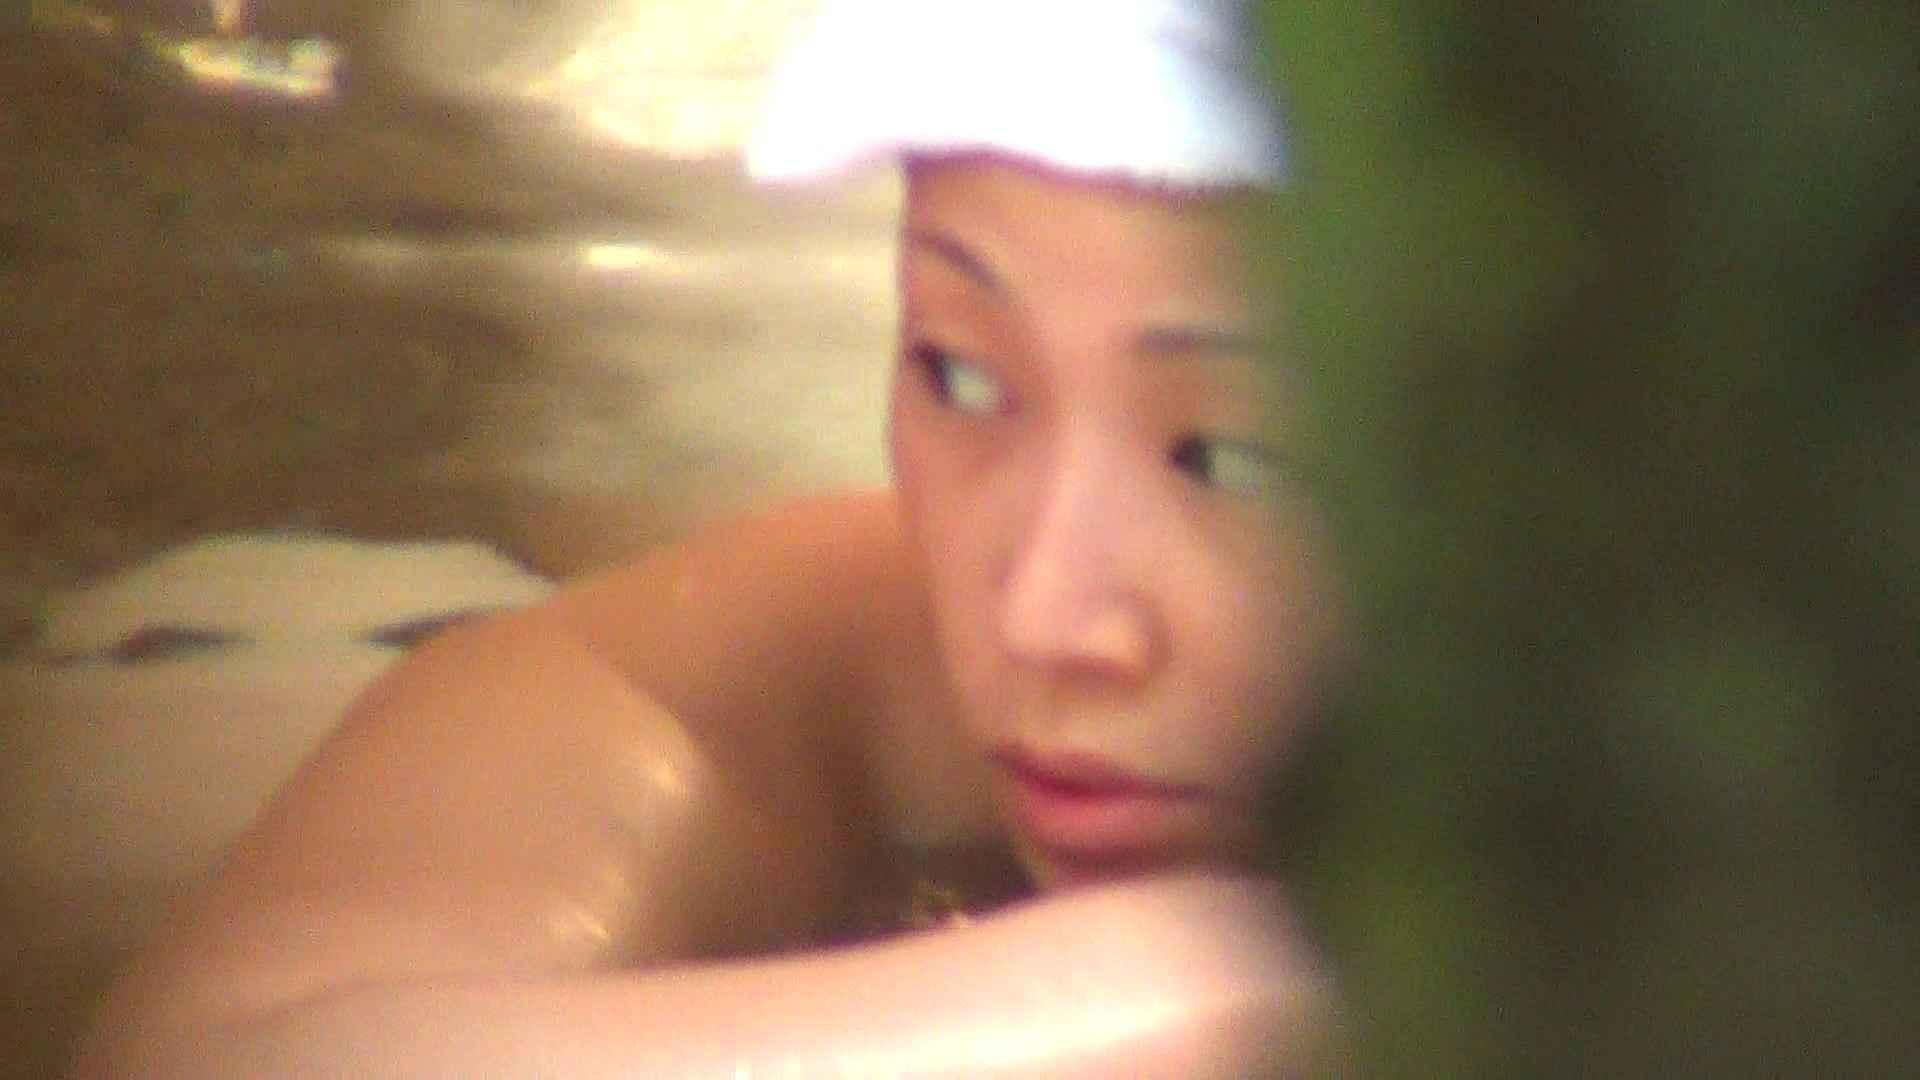 Aquaな露天風呂Vol.281 OLセックス  78画像 27